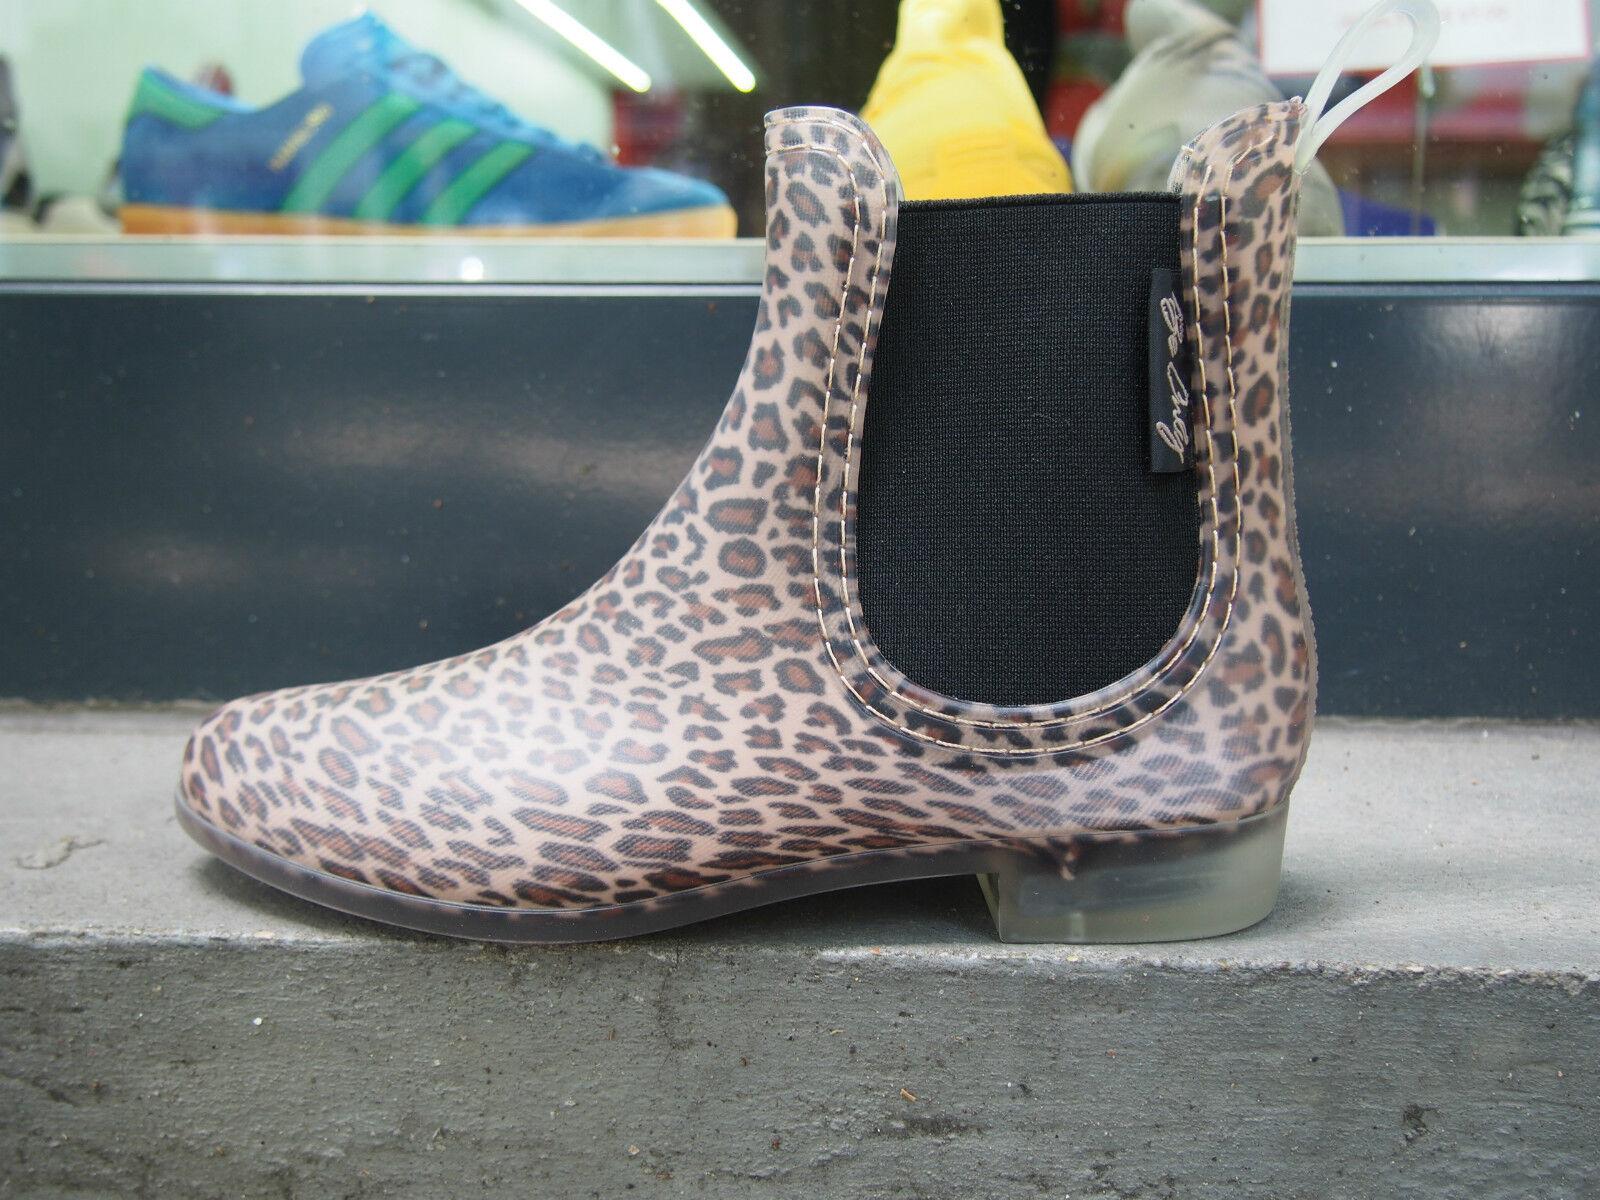 Be Only Gummistiefel Leopard matt marron Damen Stiefeletten NEU Regen Schuhe